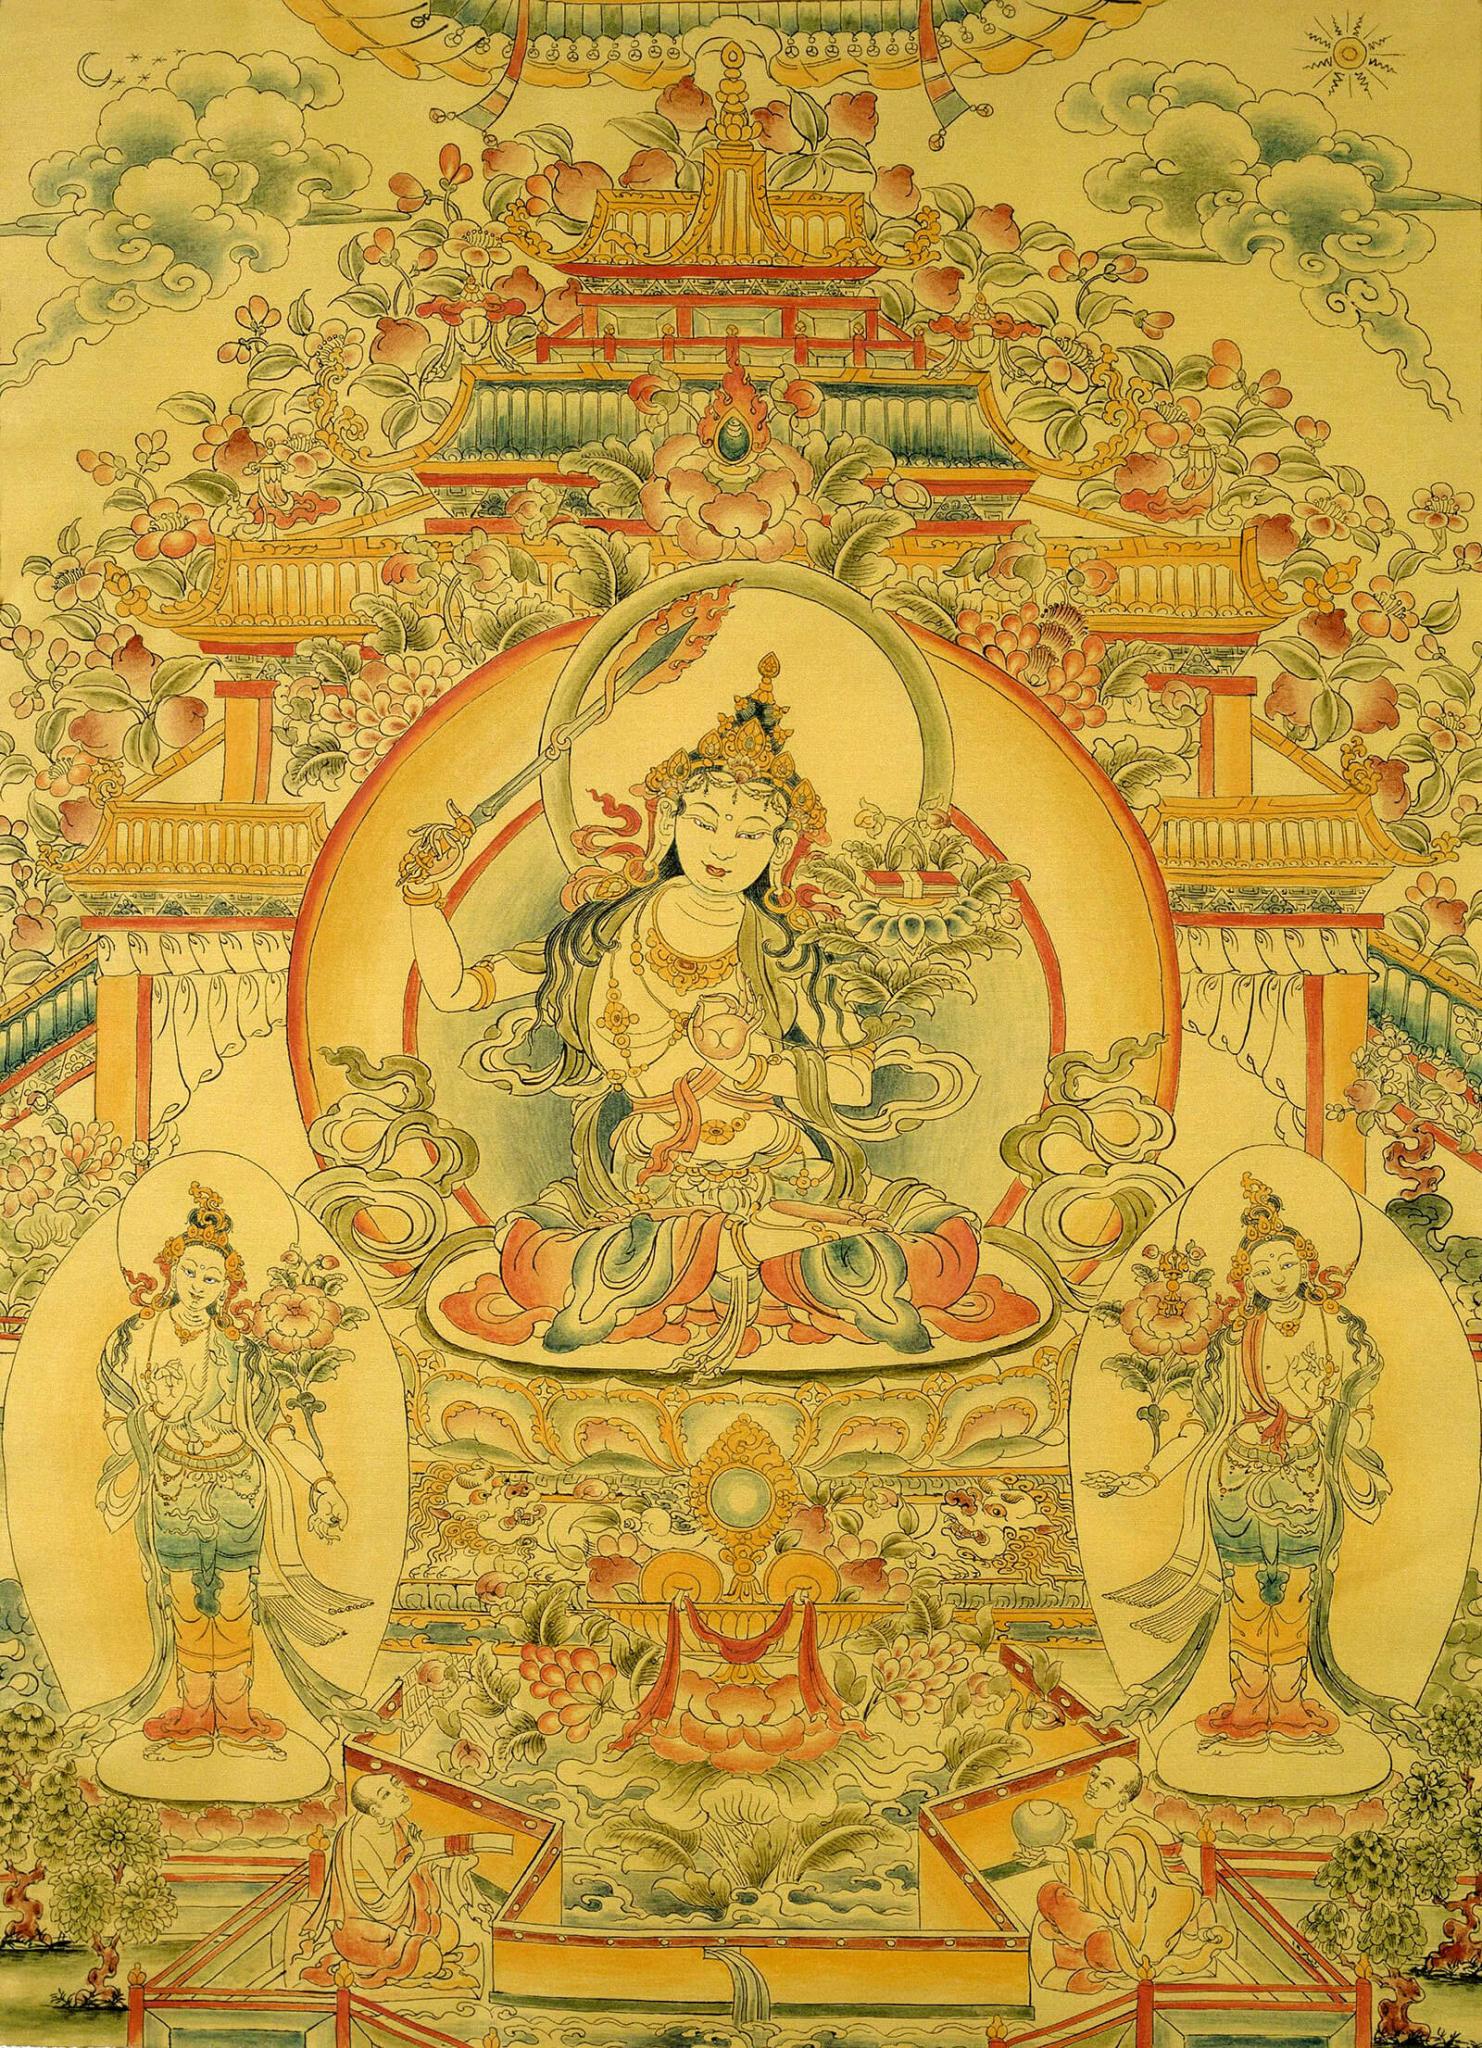 манджушри, бодхисаттва, мудрость, дзогчен, искусство танка, дудко